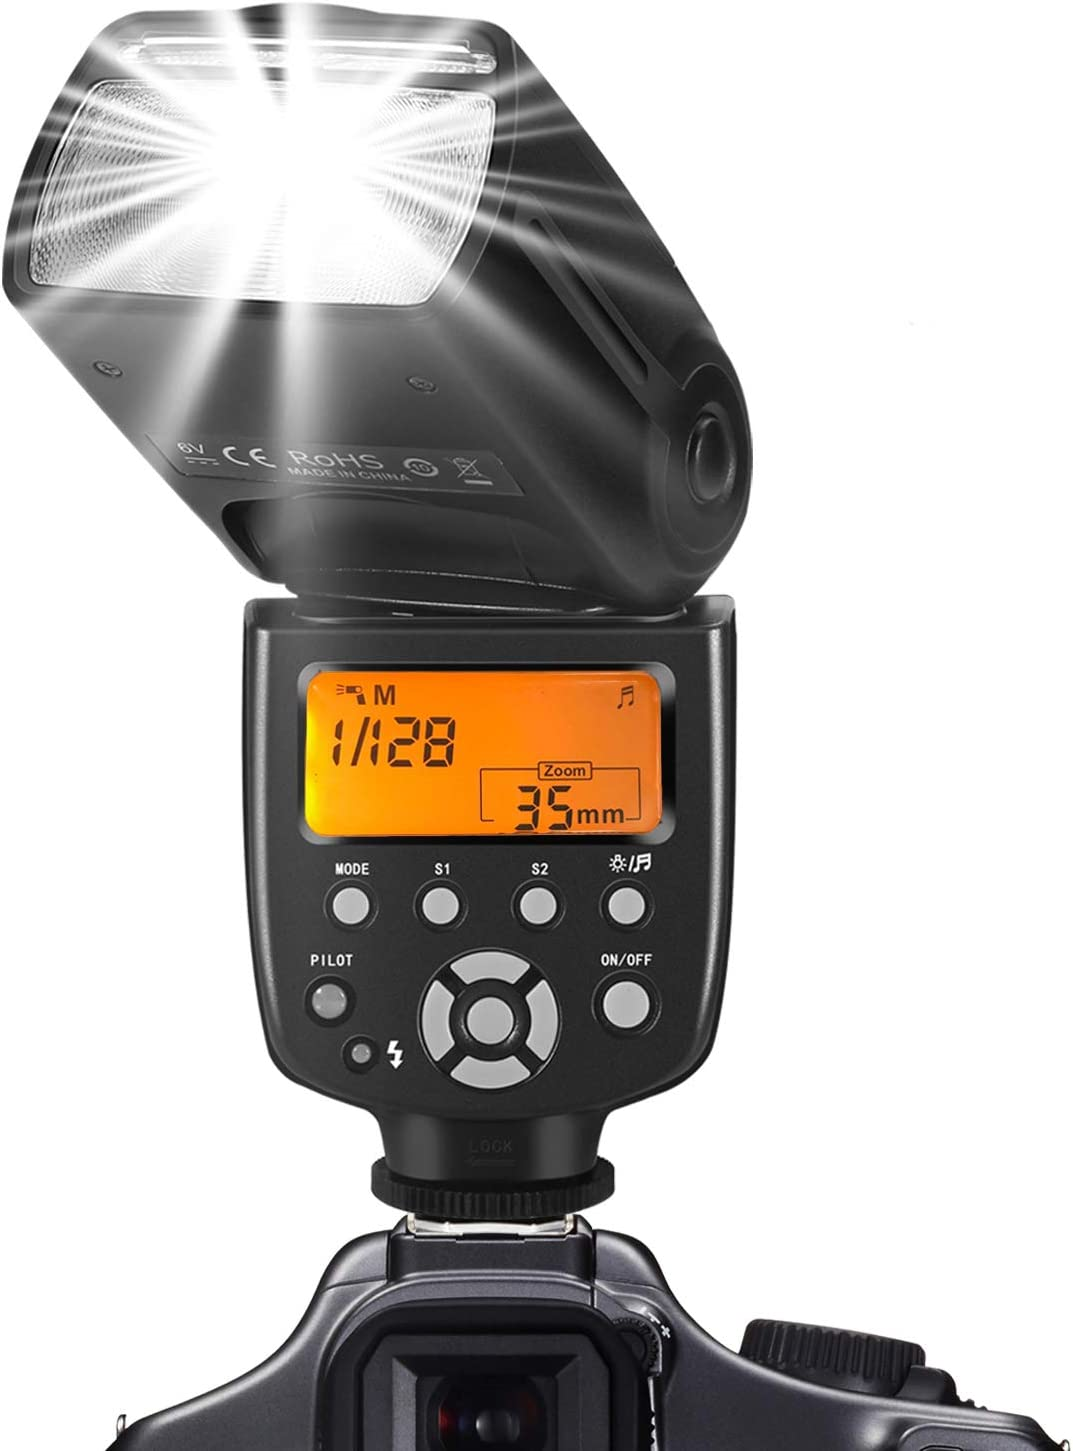 Flash Speedlite, Camera Flash for Canon Nikon Panasonic Olympus Pentax and Other DSLR Flash